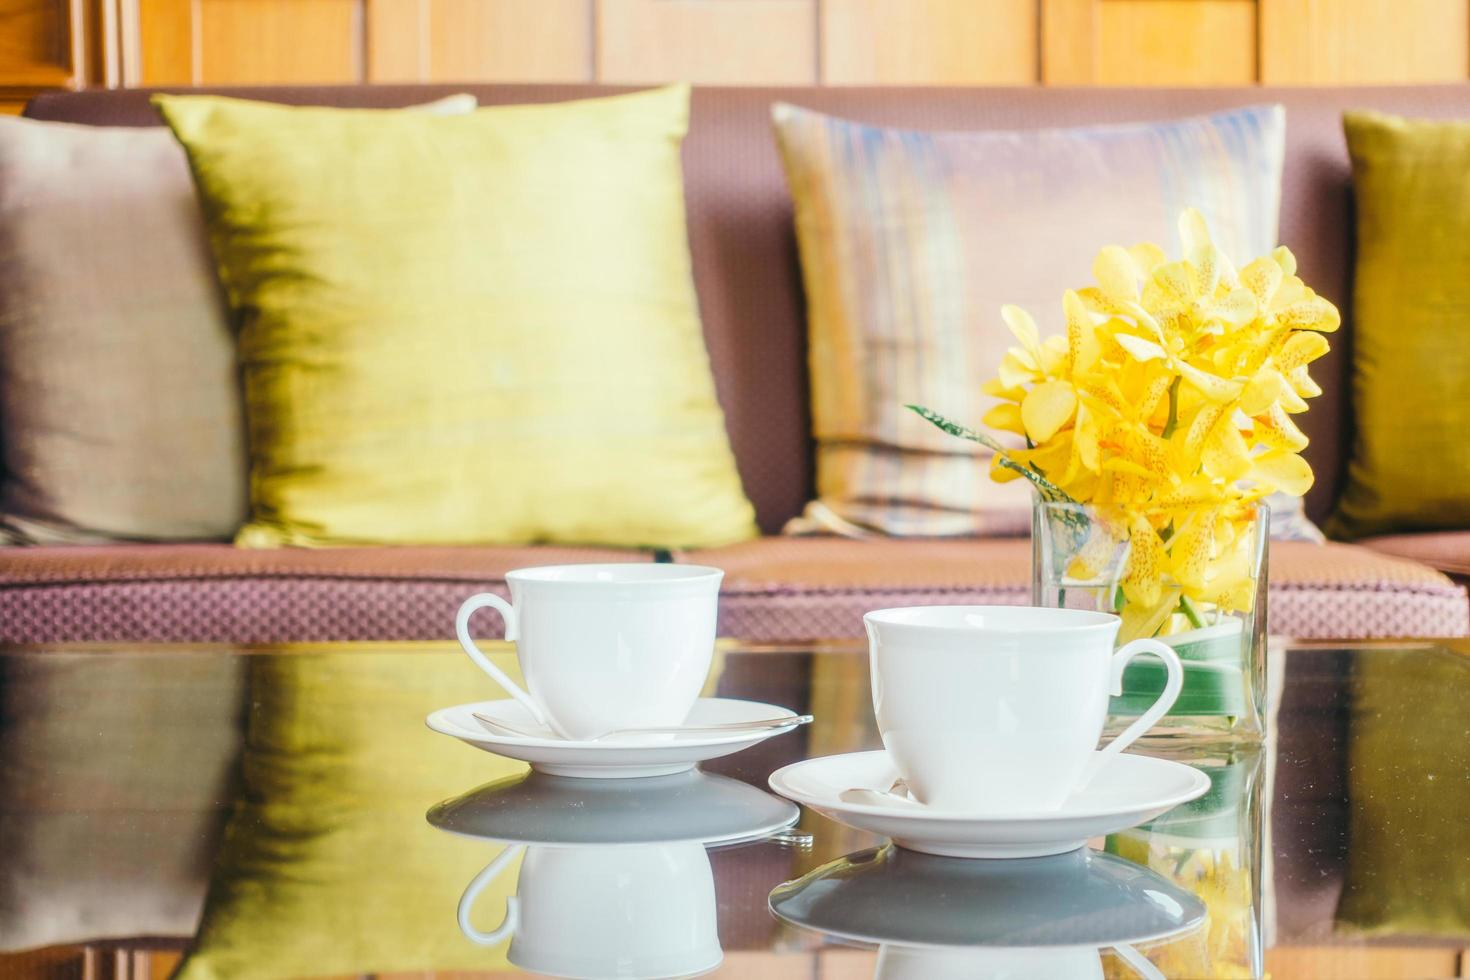 vaas bloem en witte koffiekopje op tafel en kussen op de bank foto